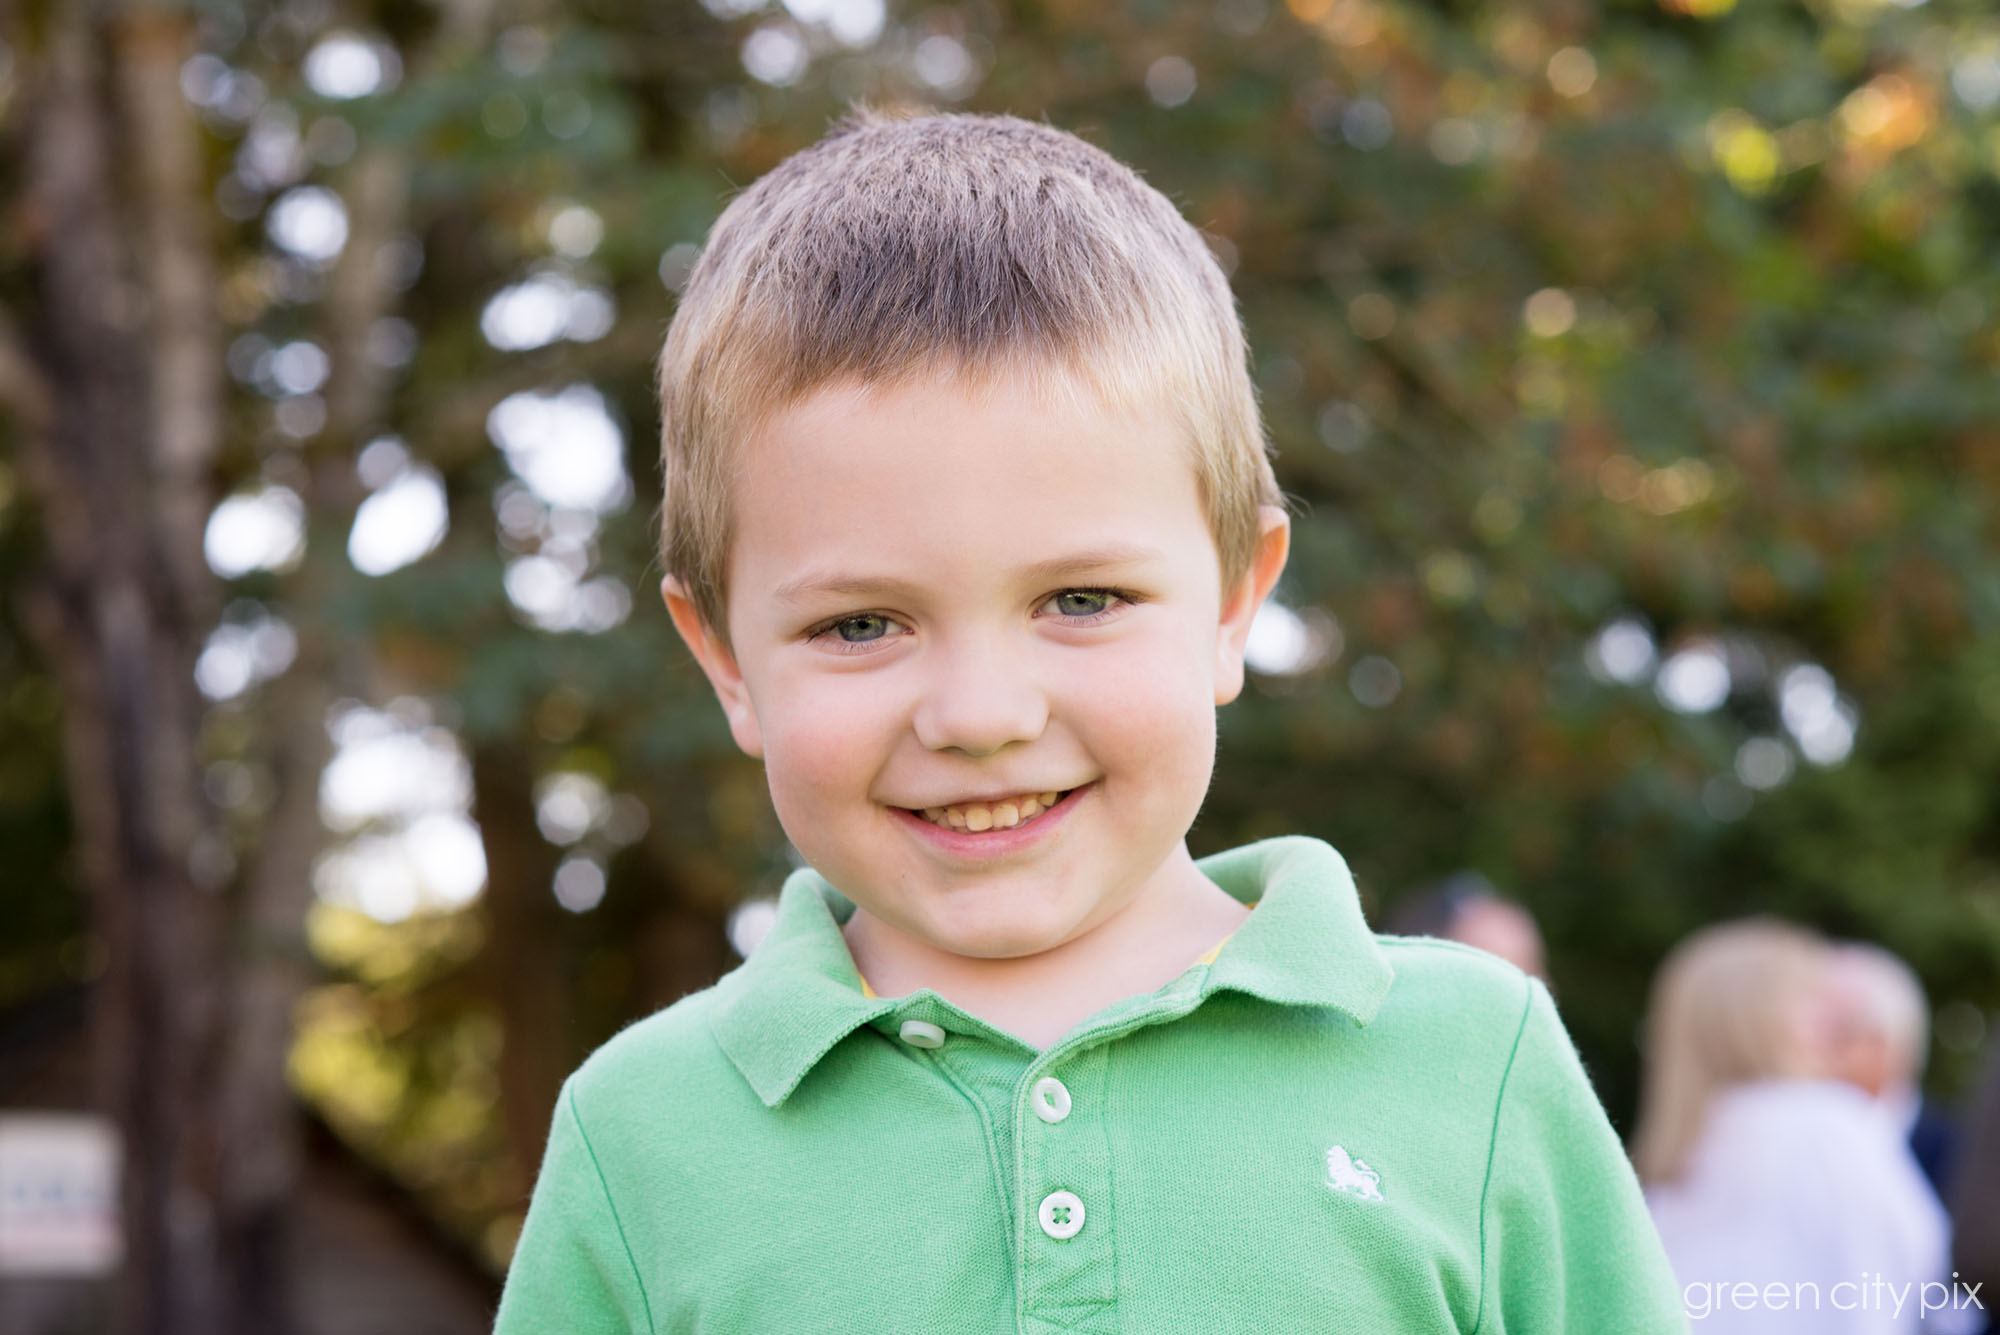 This boy was so adorable!